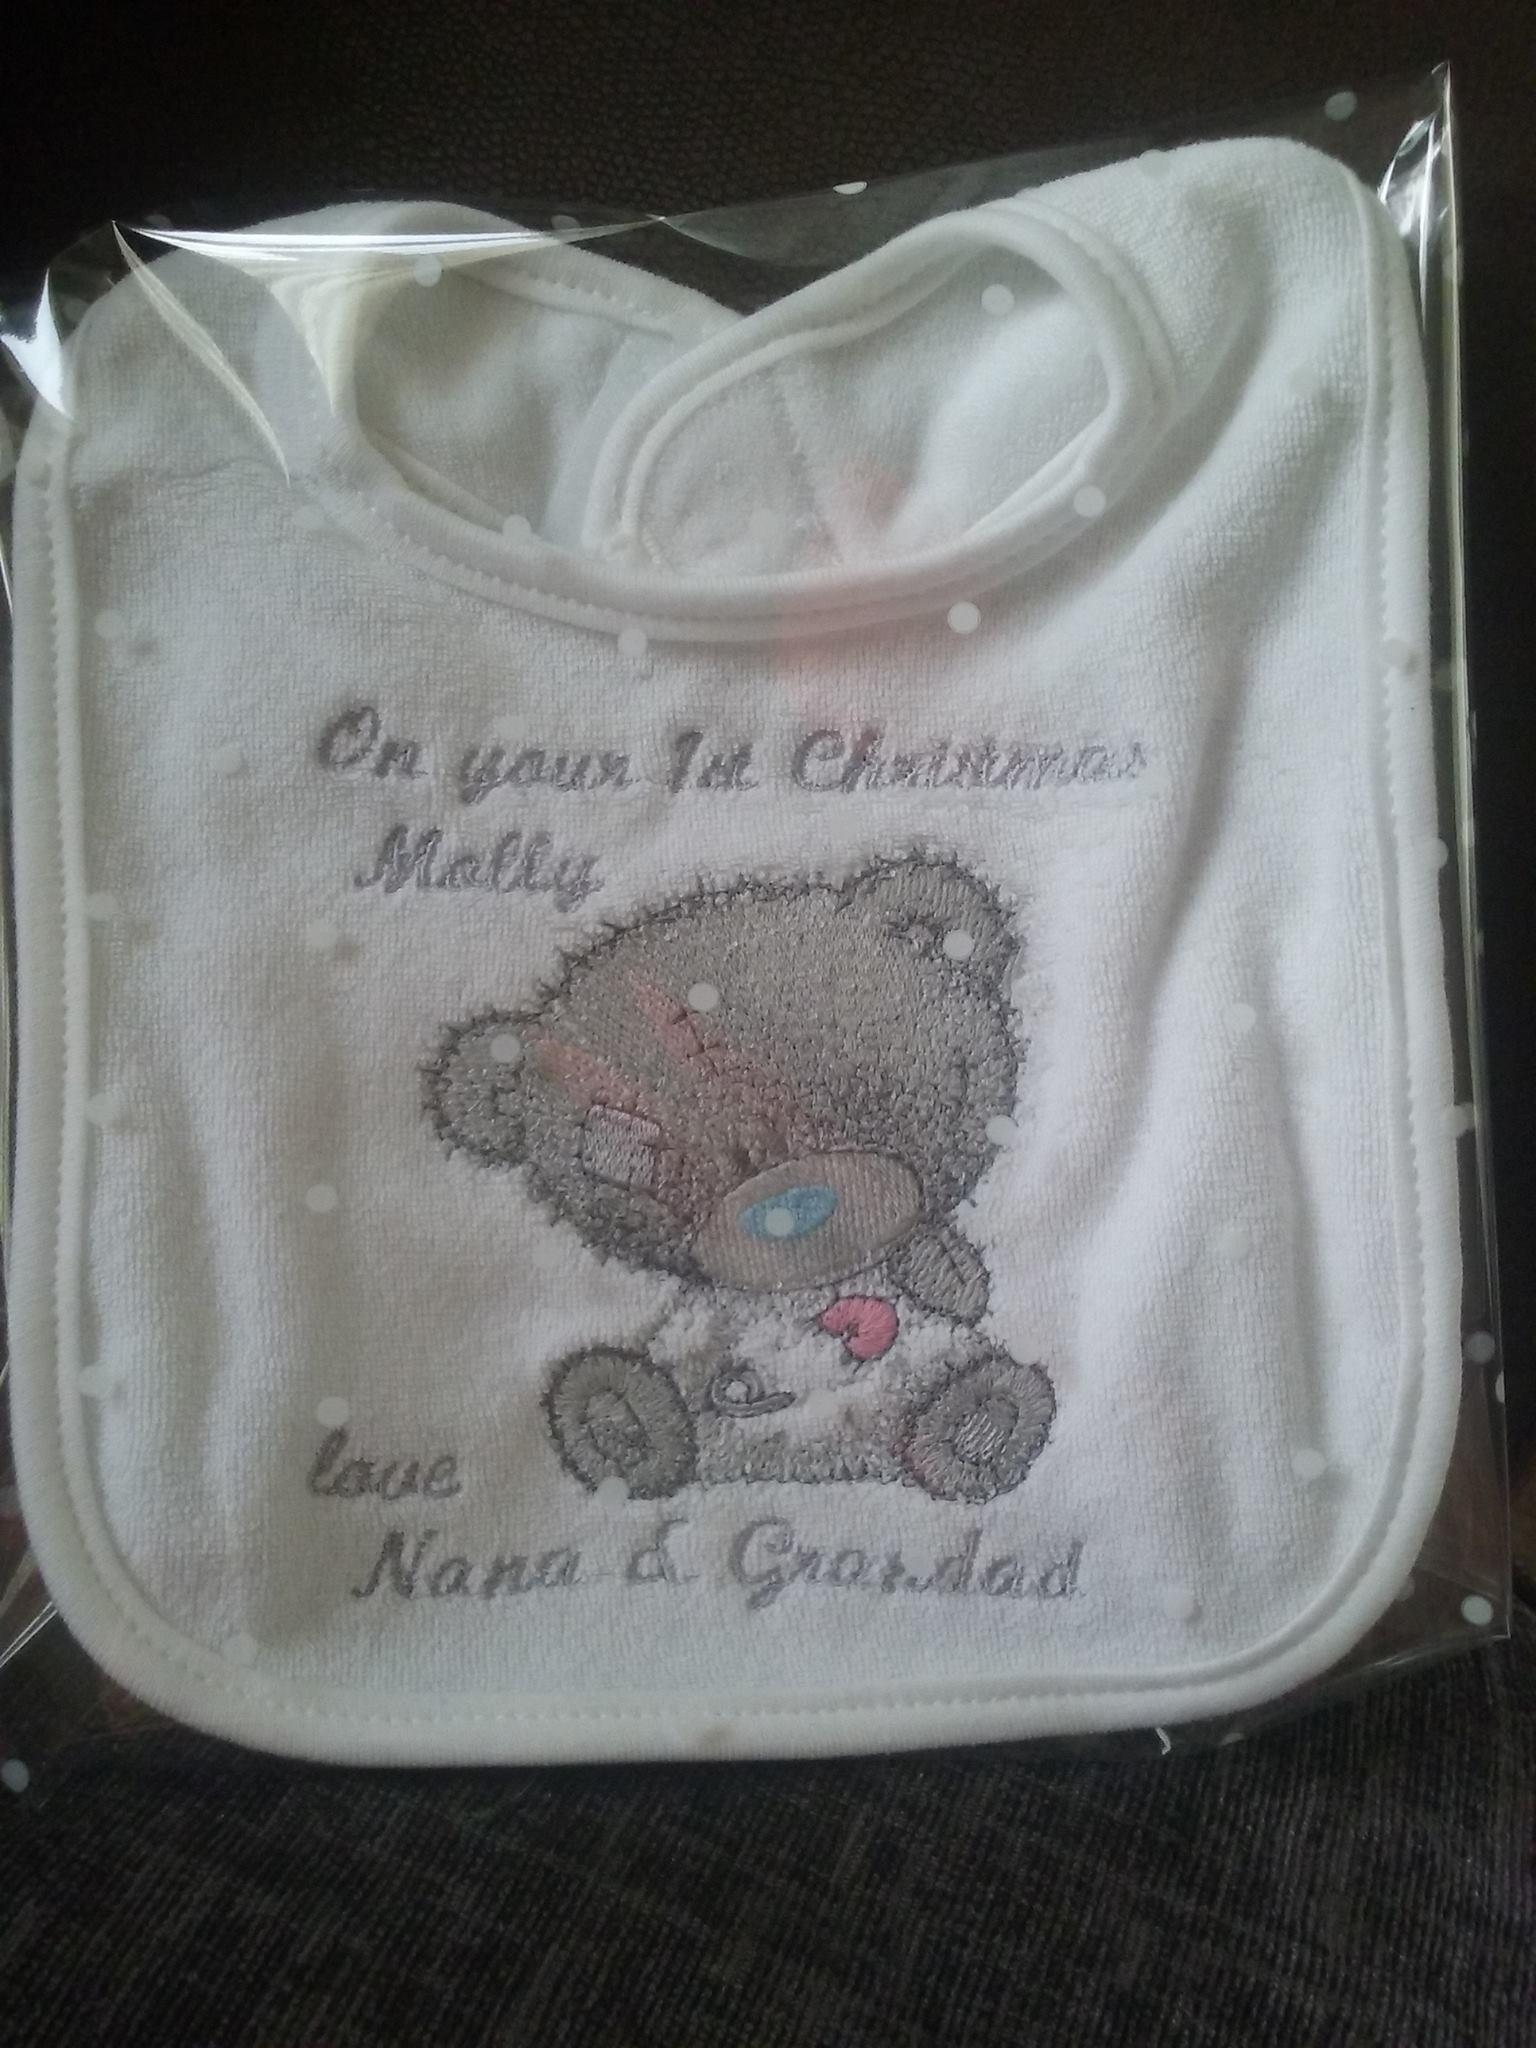 Baby bib with Tatty Teddy embroidery design